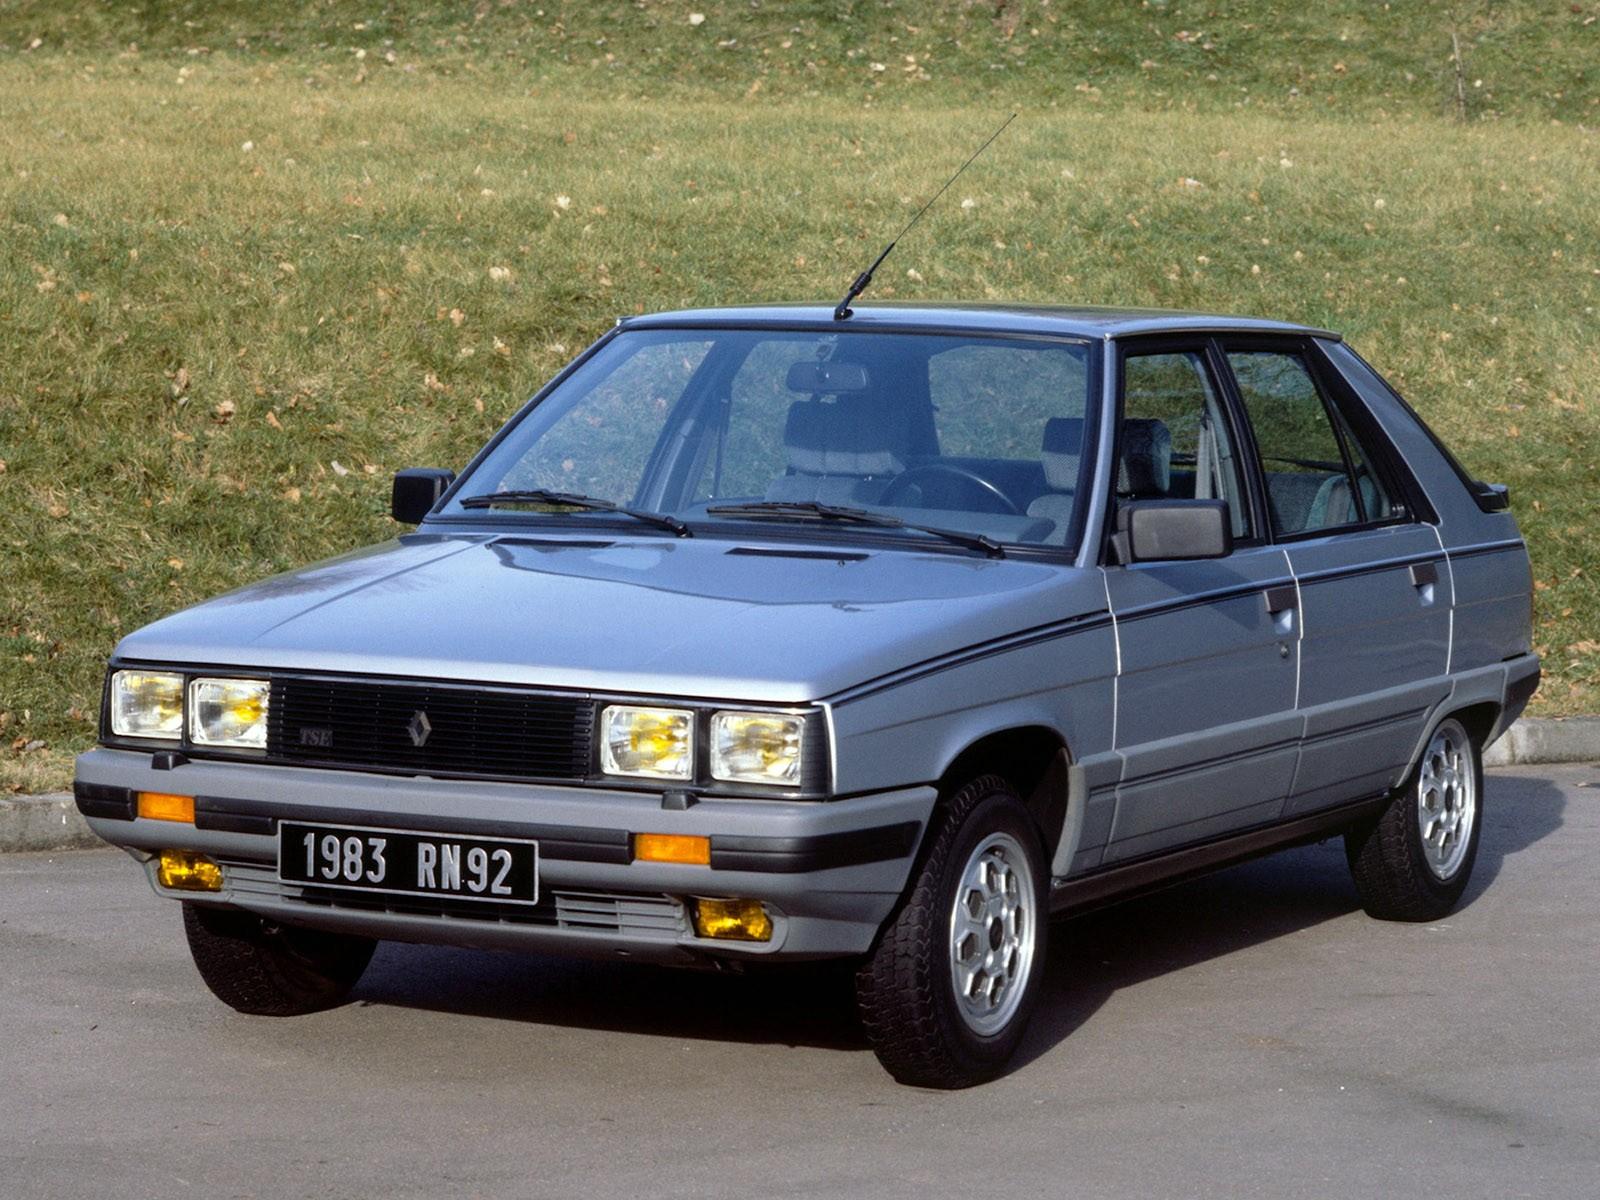 1981 Renault R11